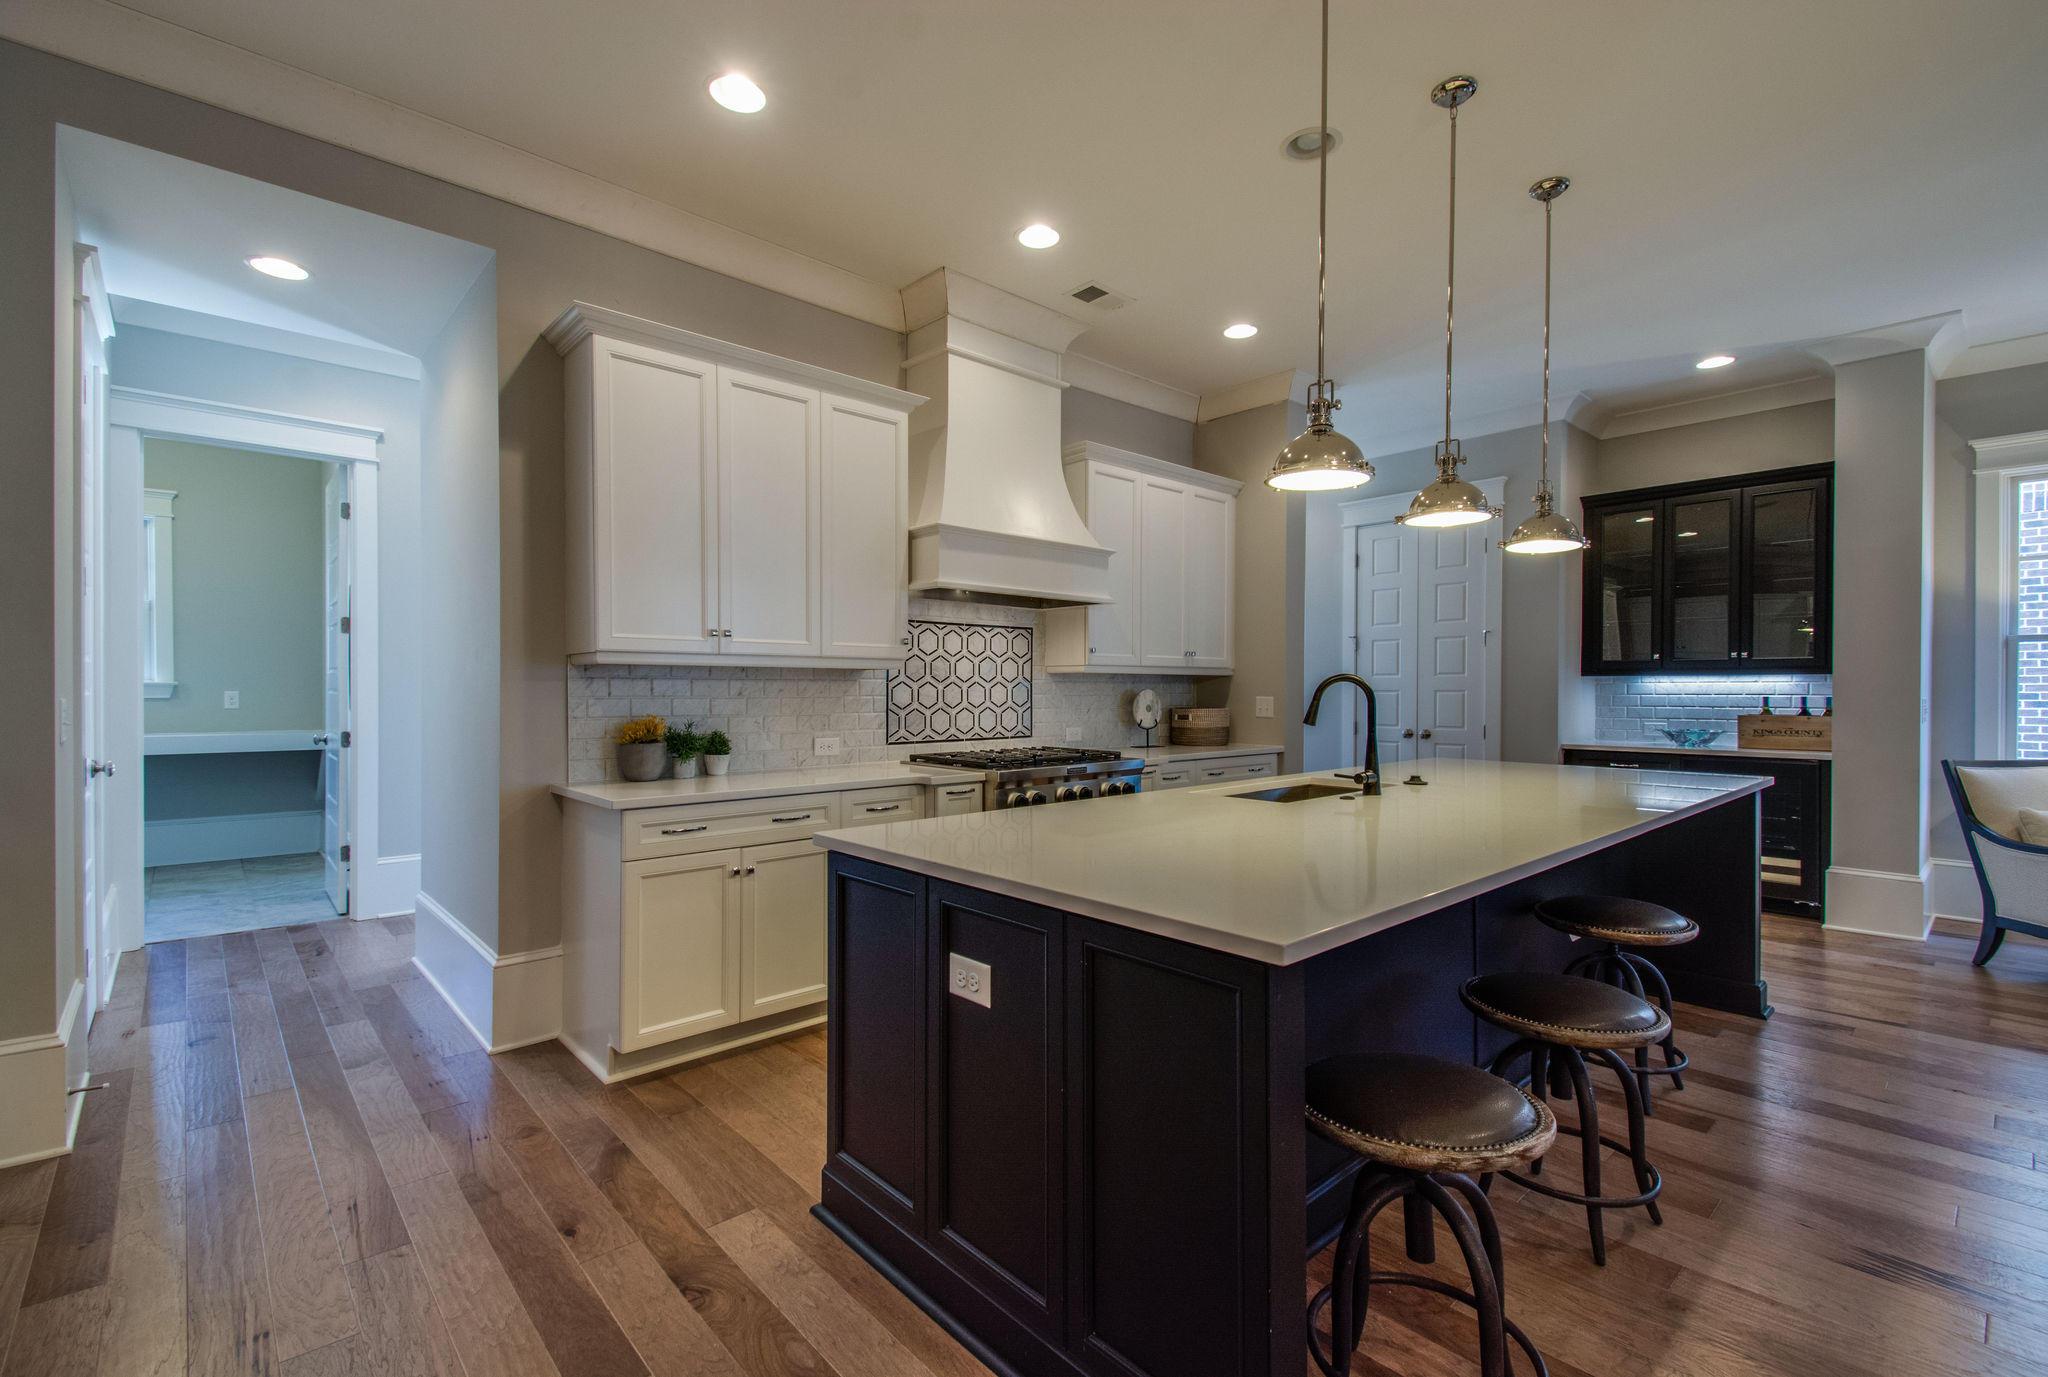 Daniel Island Park Homes For Sale - 112 Brailsford, Charleston, SC - 34